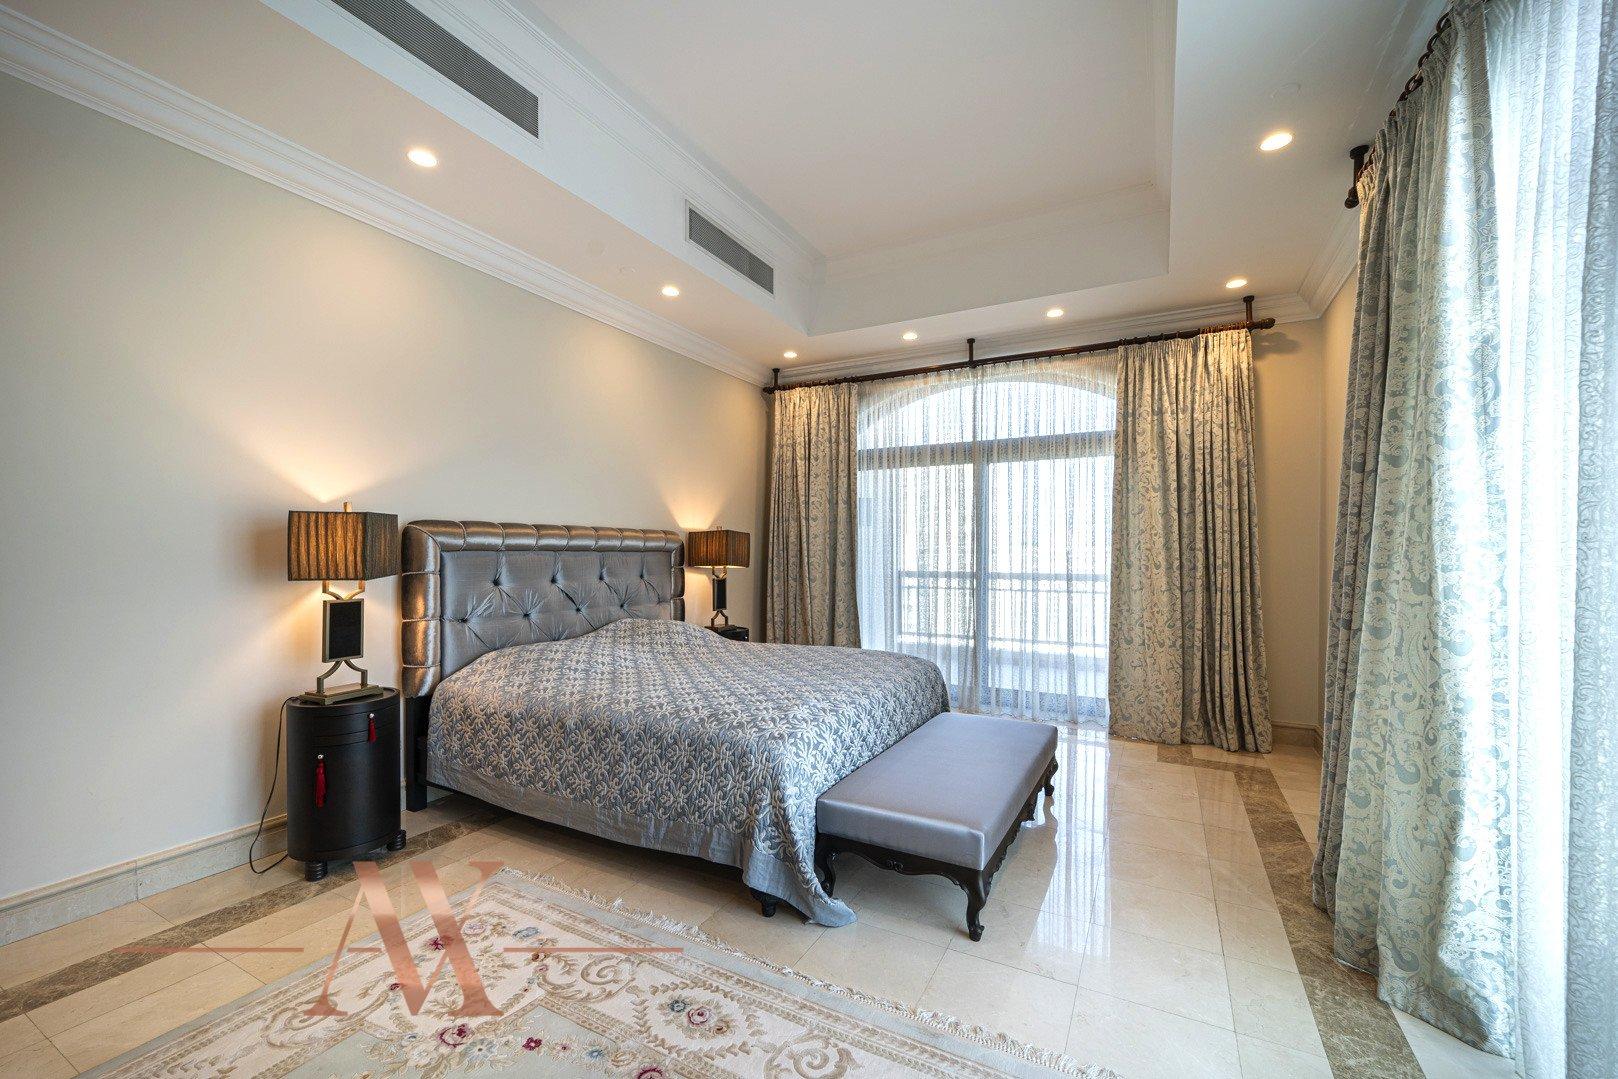 Penthouse for sale in Dubai, UAE, 5 bedrooms, 1057 m2, No. 23747 – photo 14